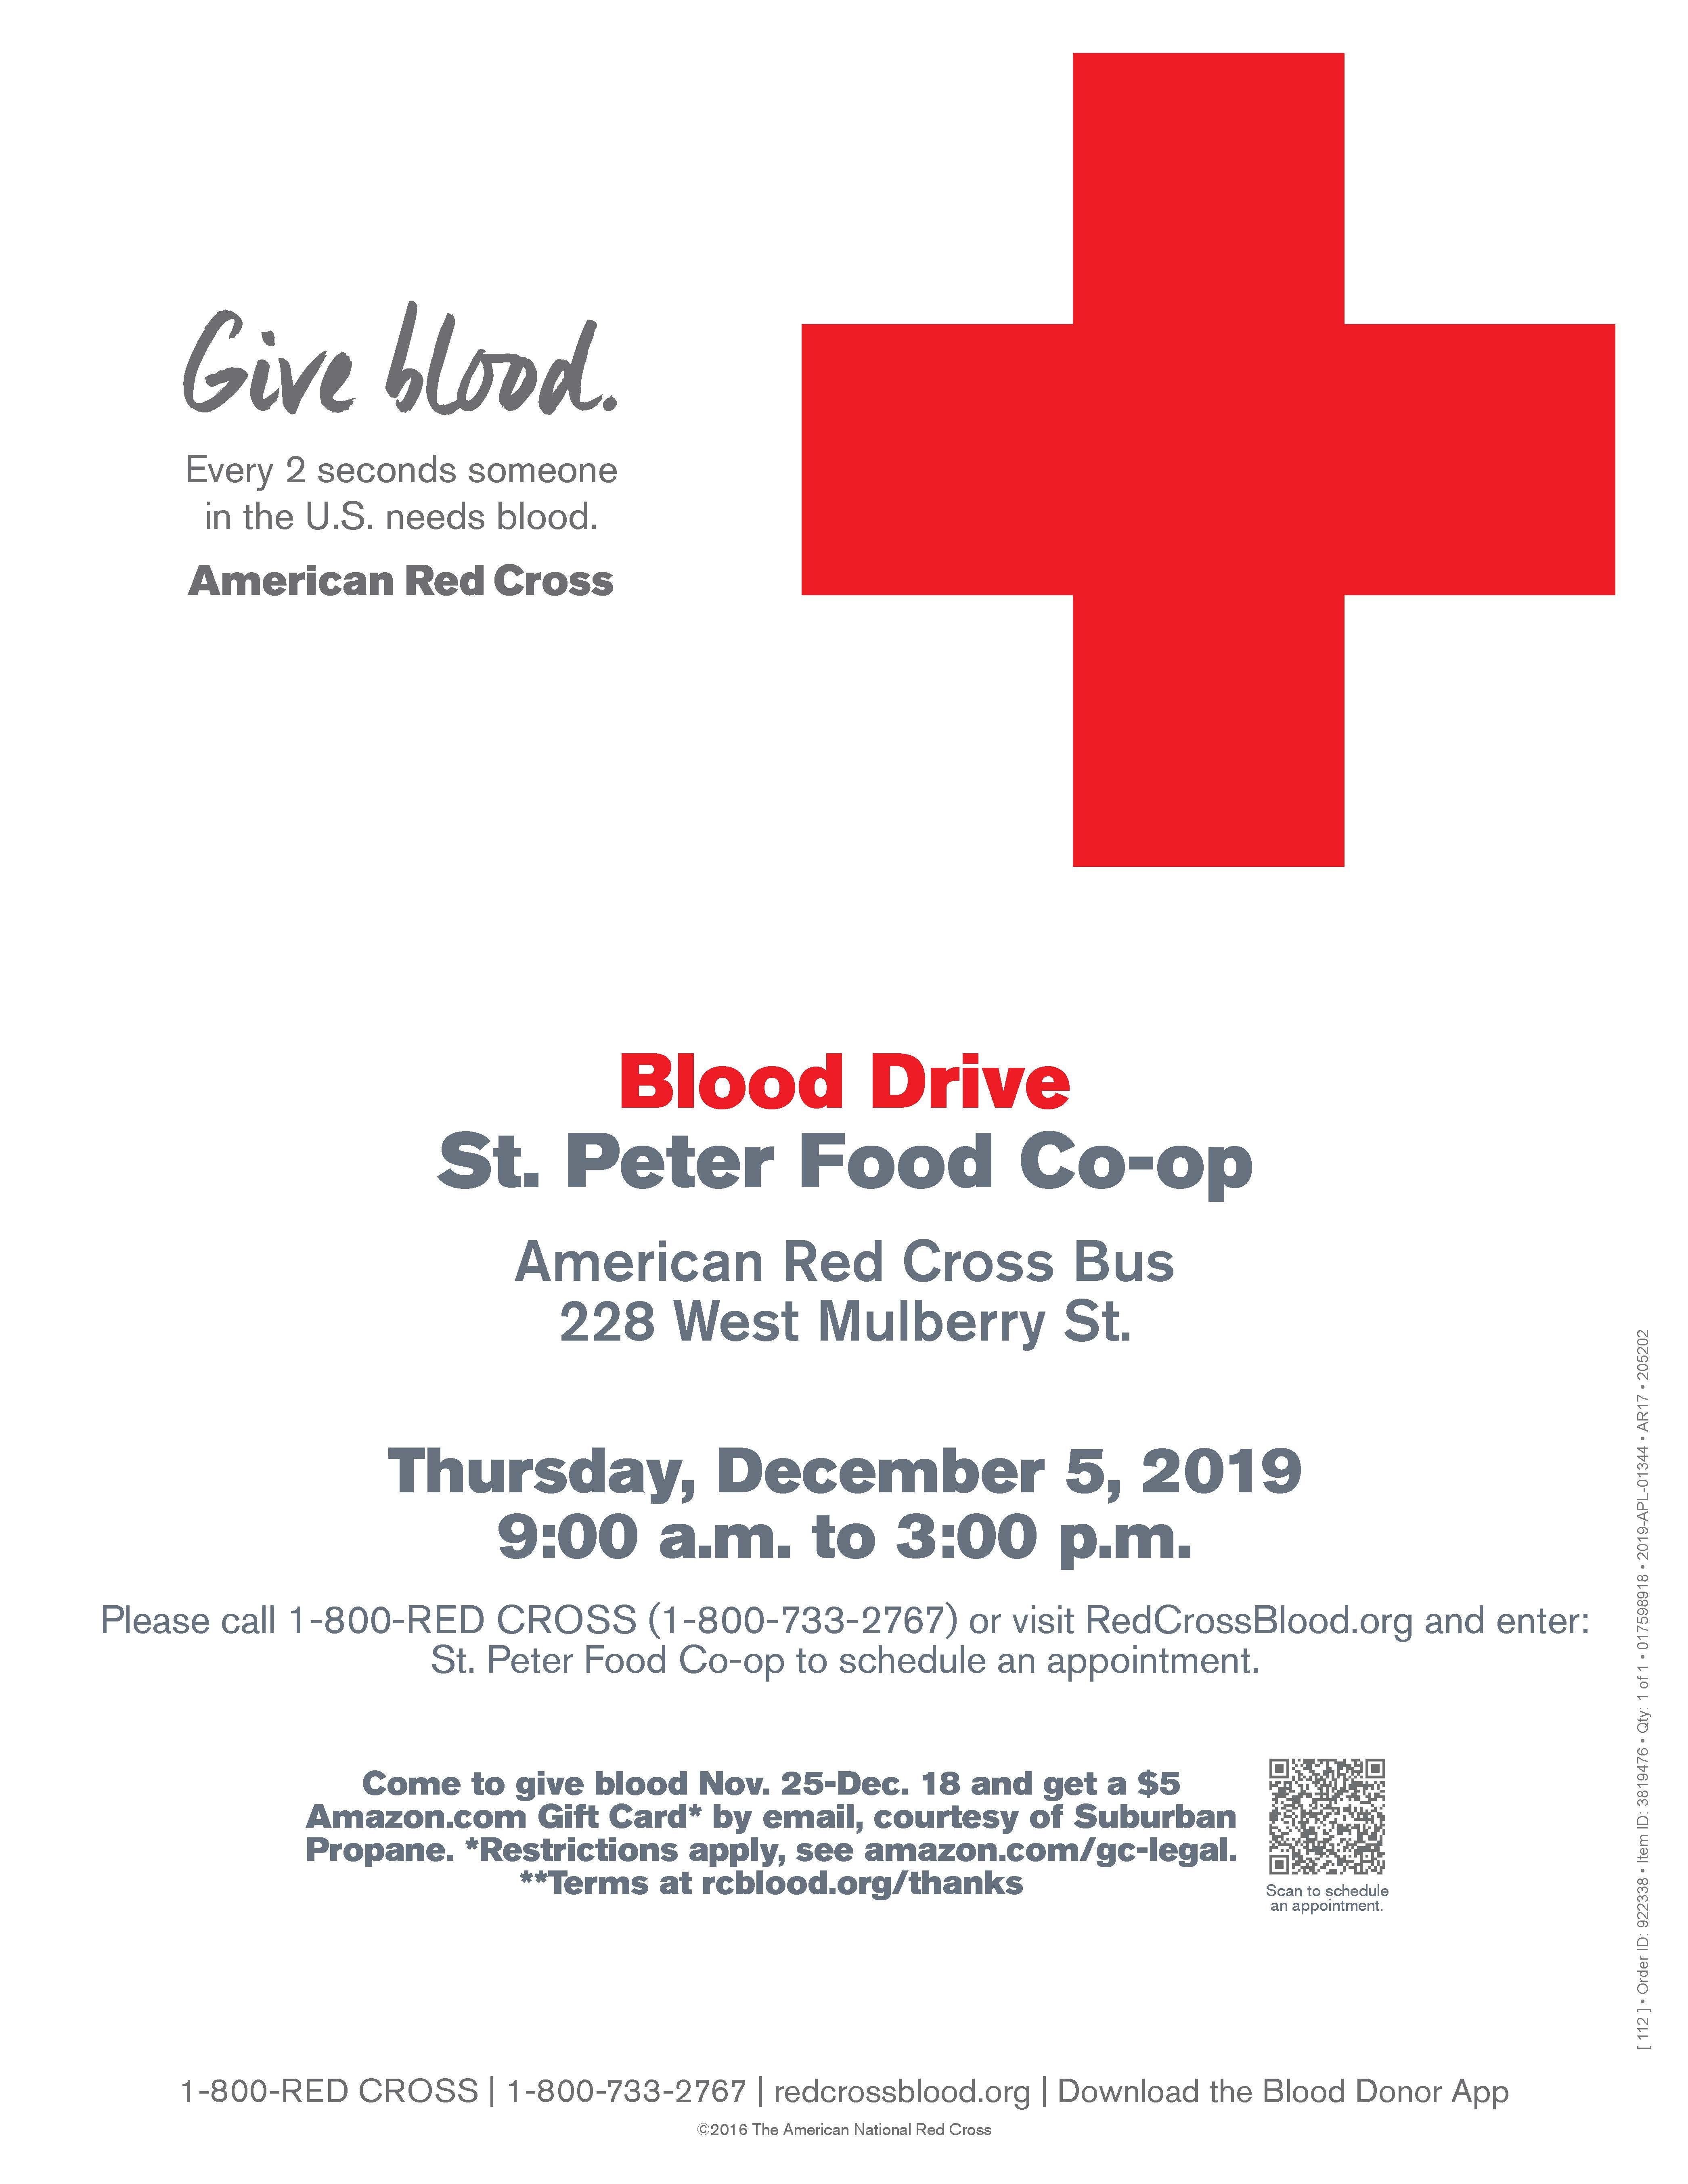 Blood drive flyer